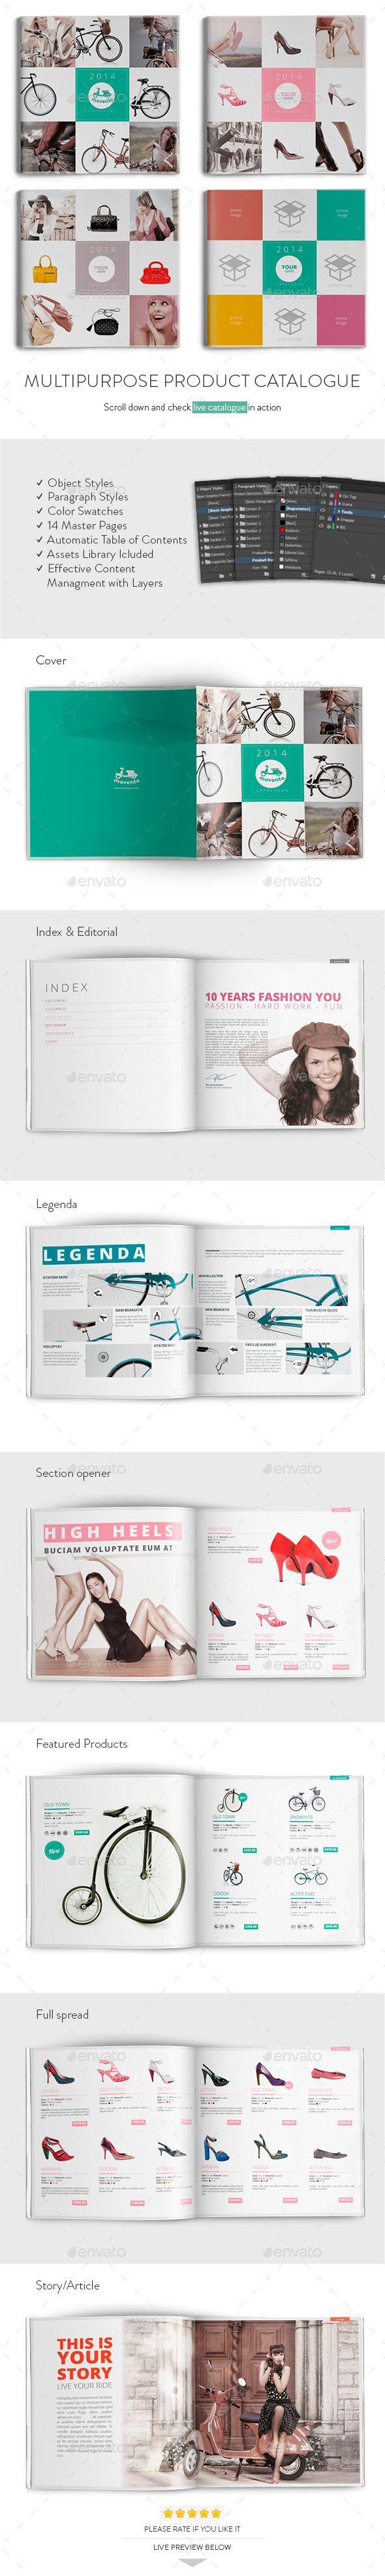 Multipurpose Product Catalogue #product #catalogue